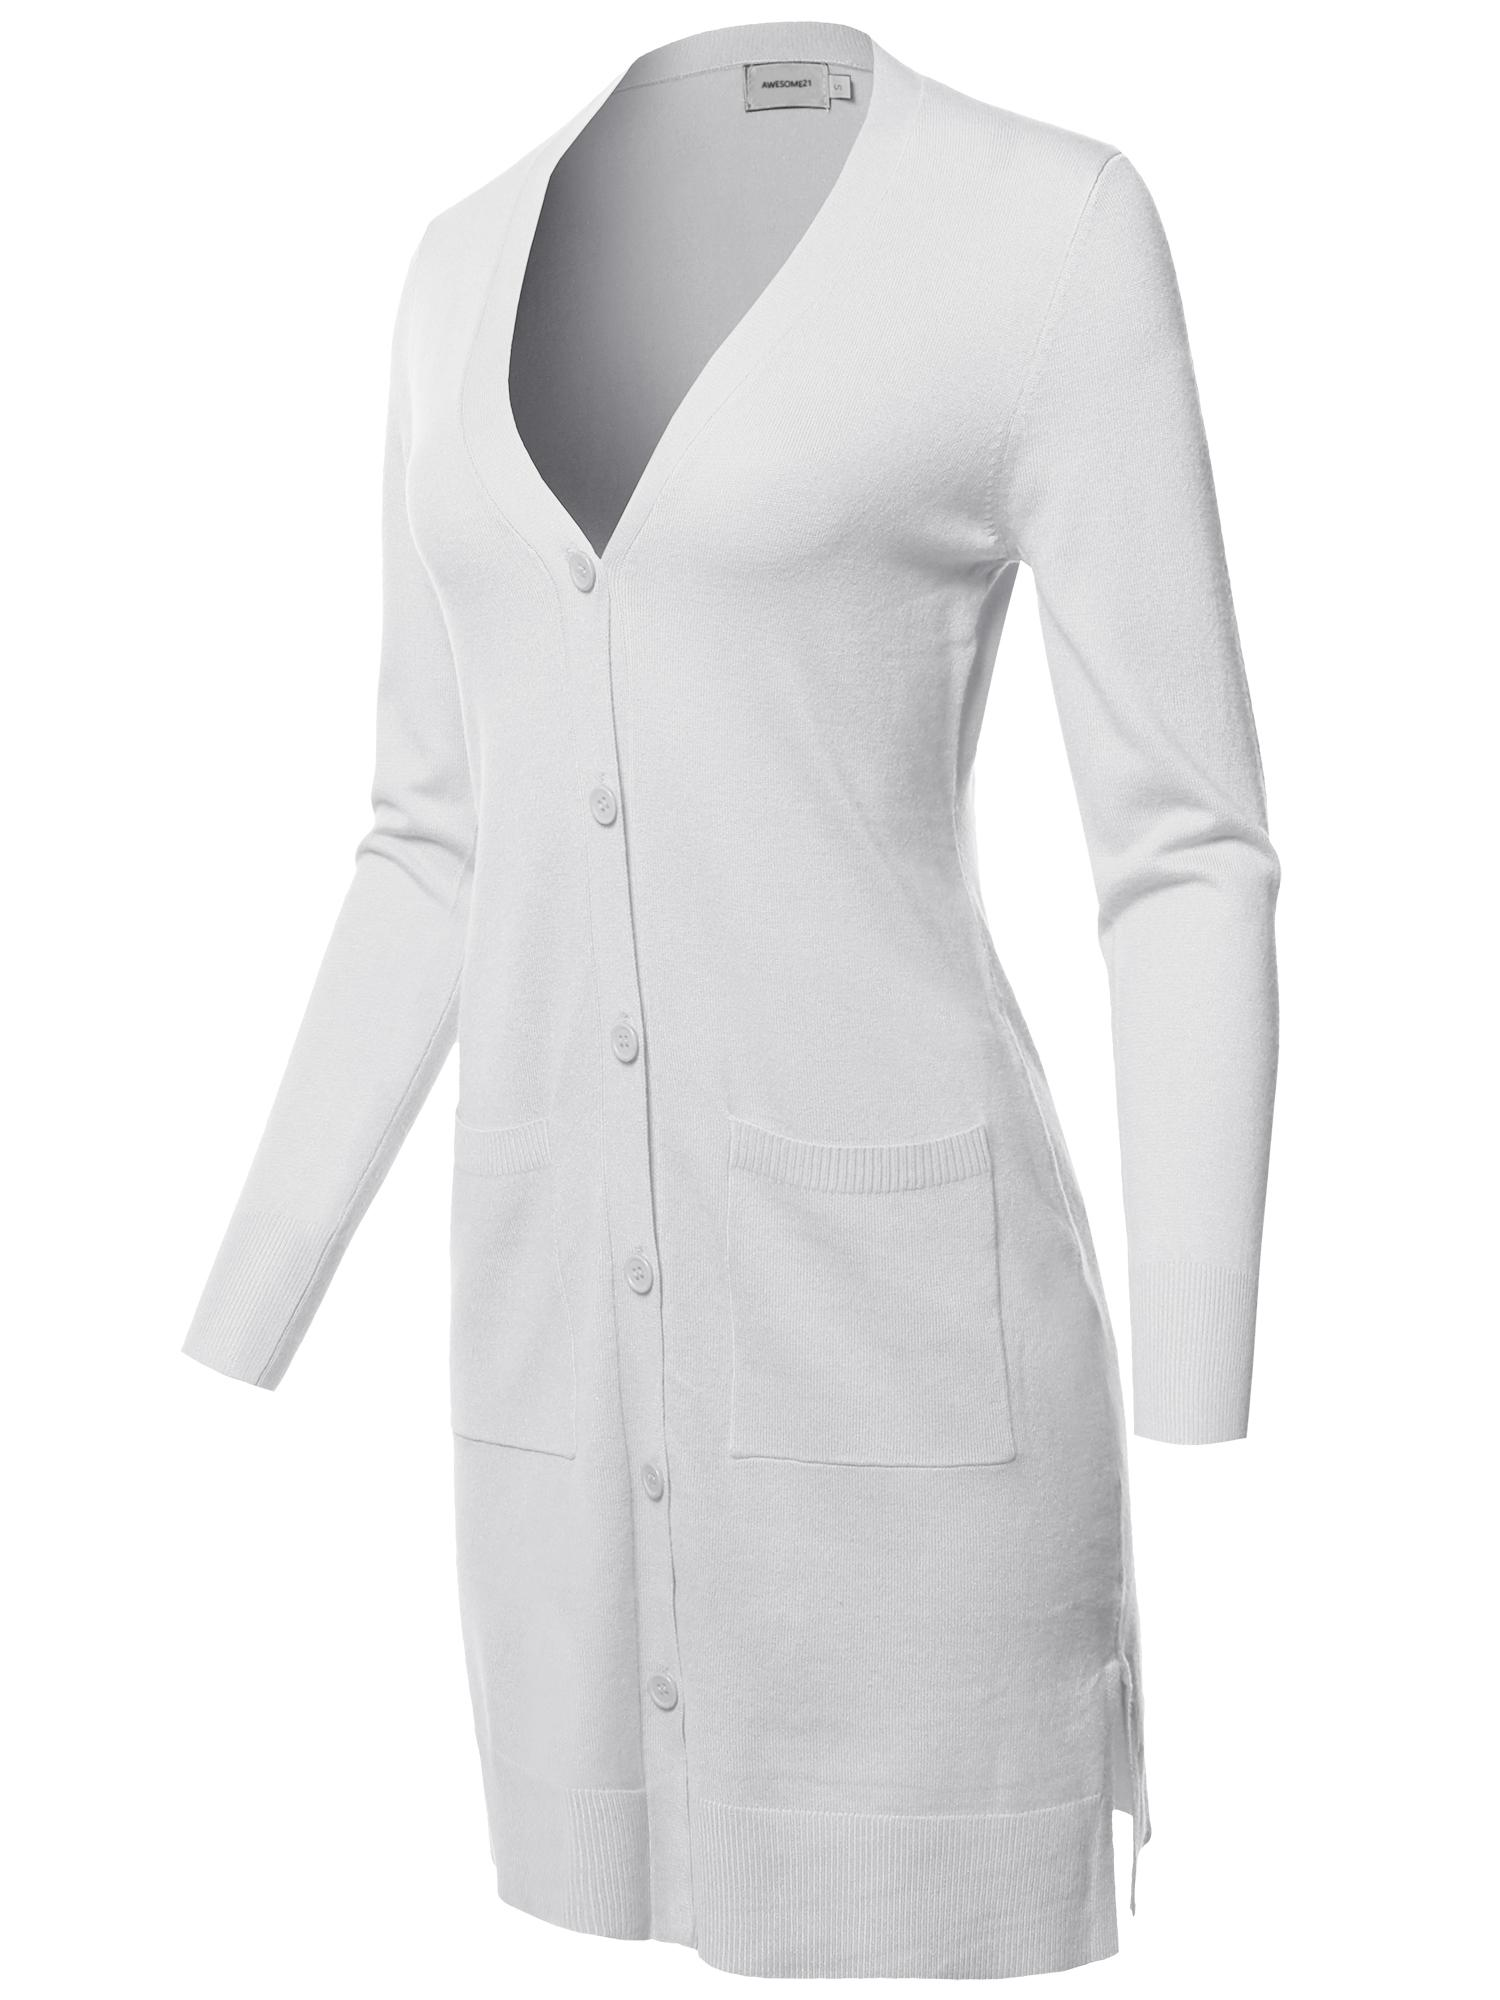 FashionOutfit Women's Casual Button Up Long-Line Sweater Viscose Knit Cardigan